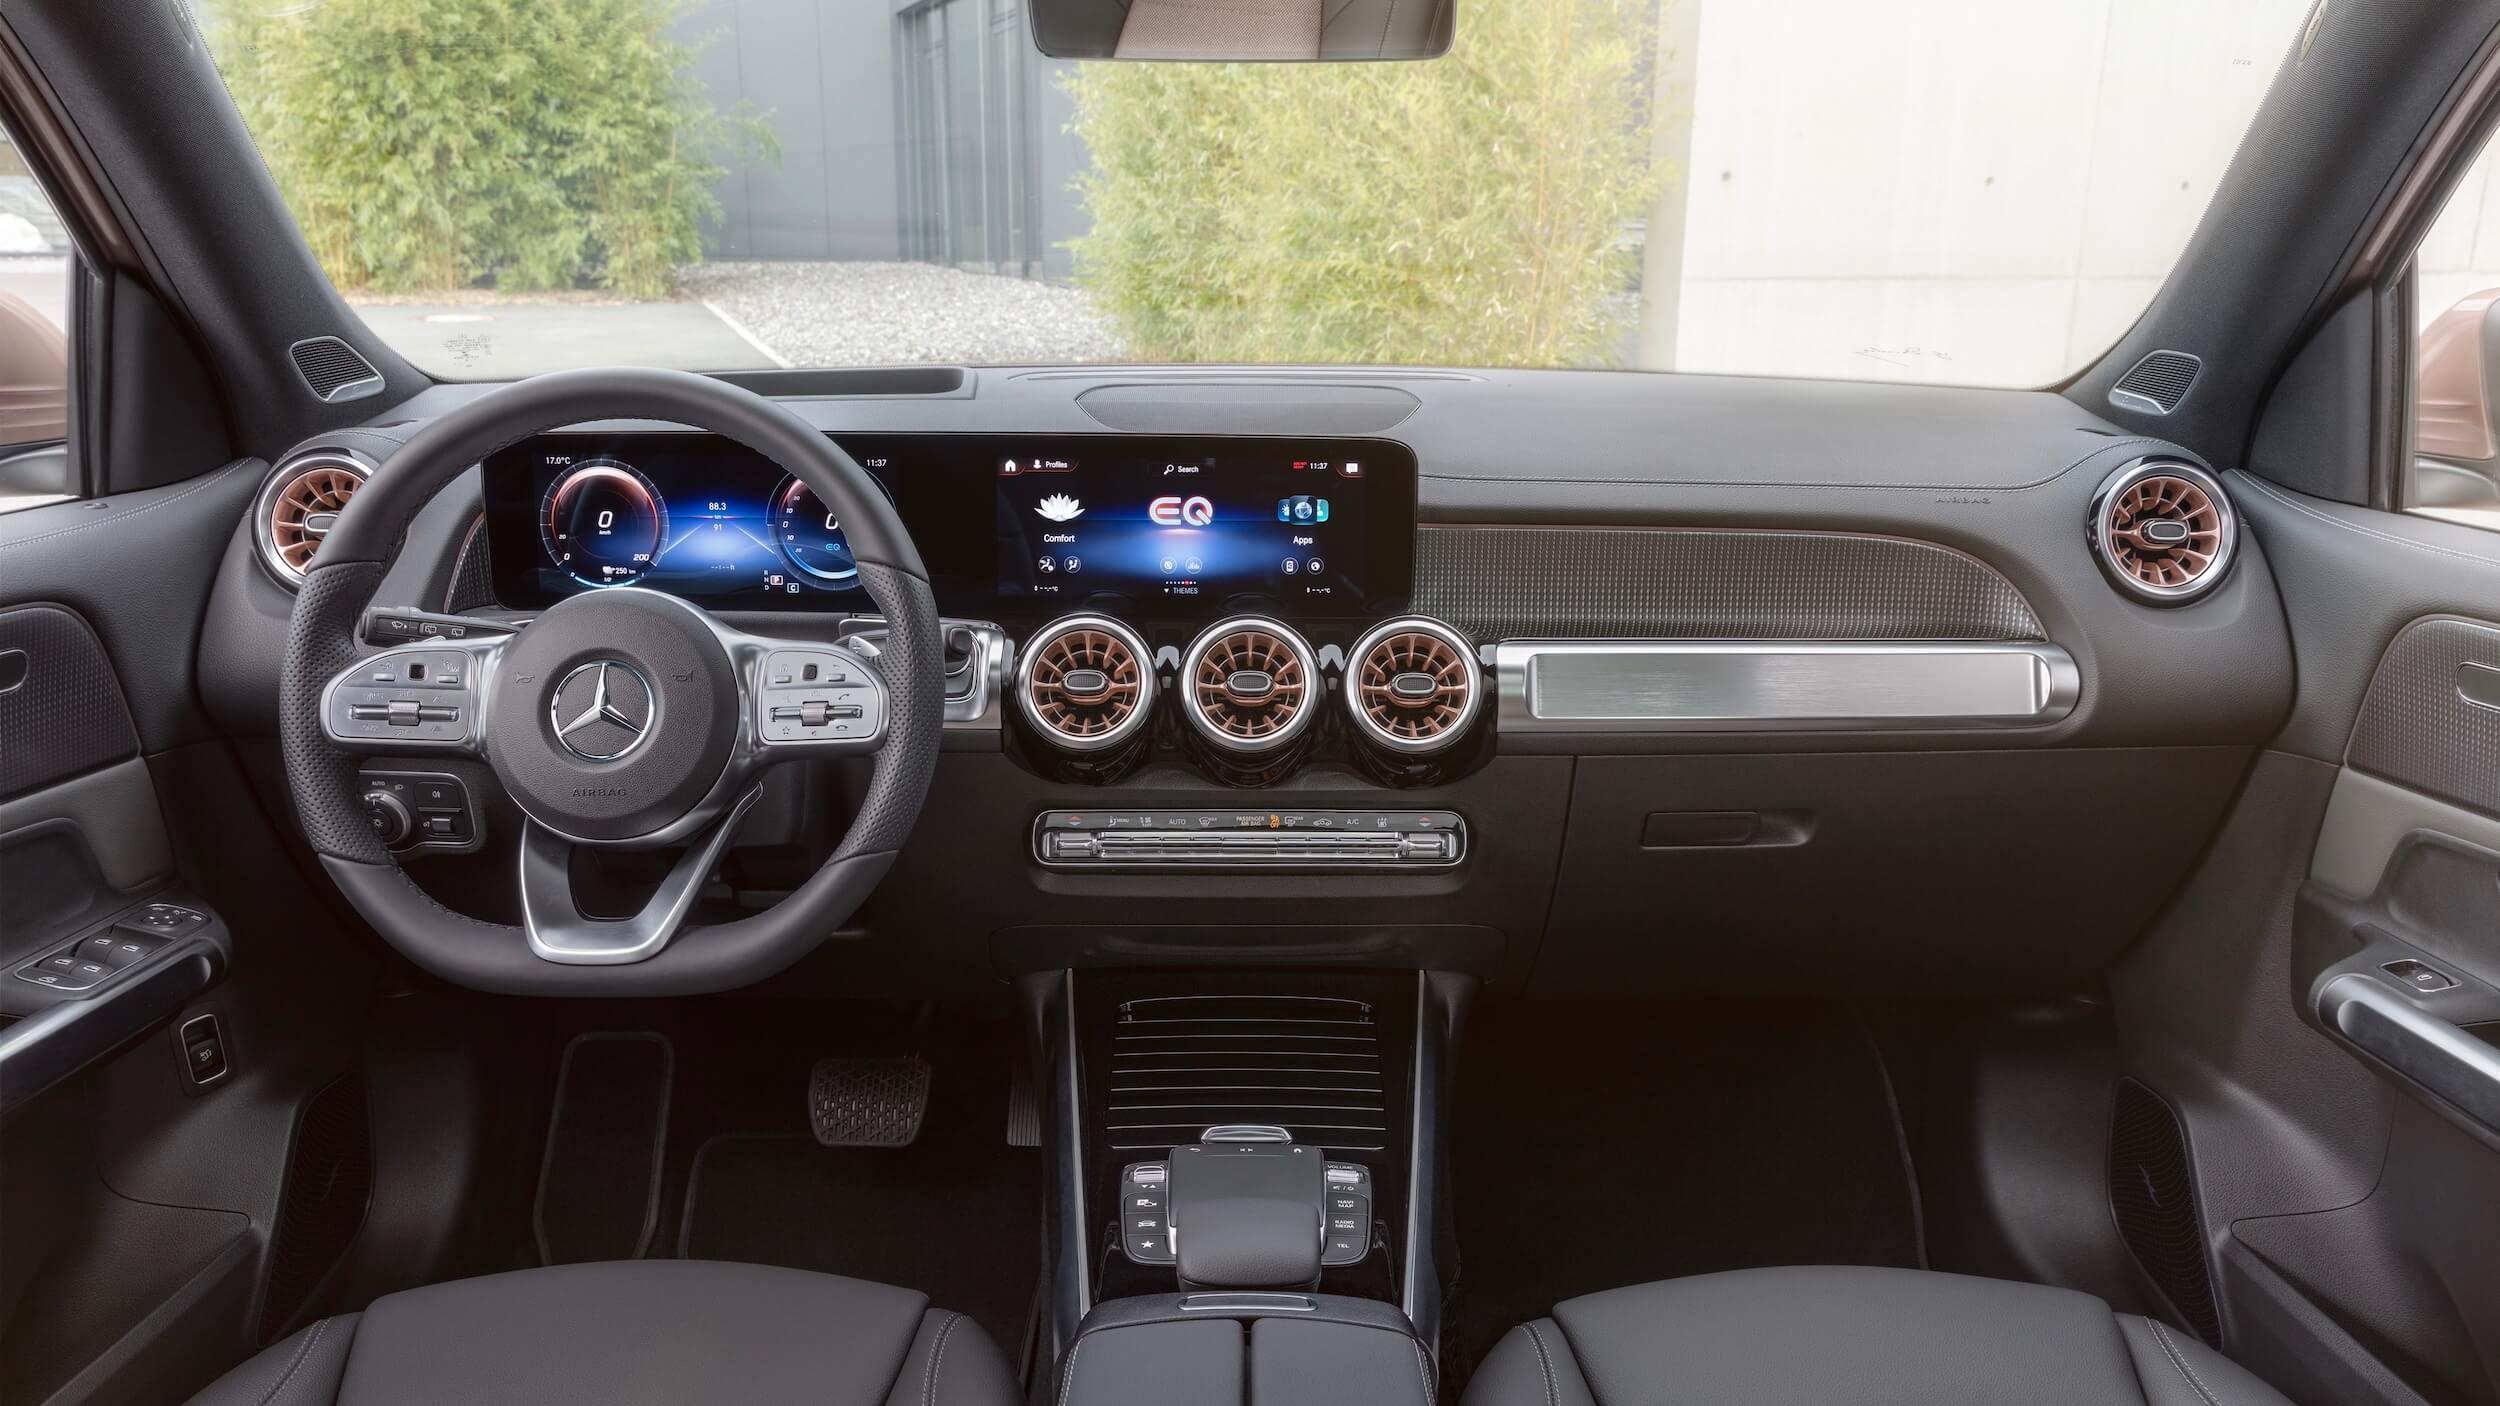 Mercedes EQB dashboard